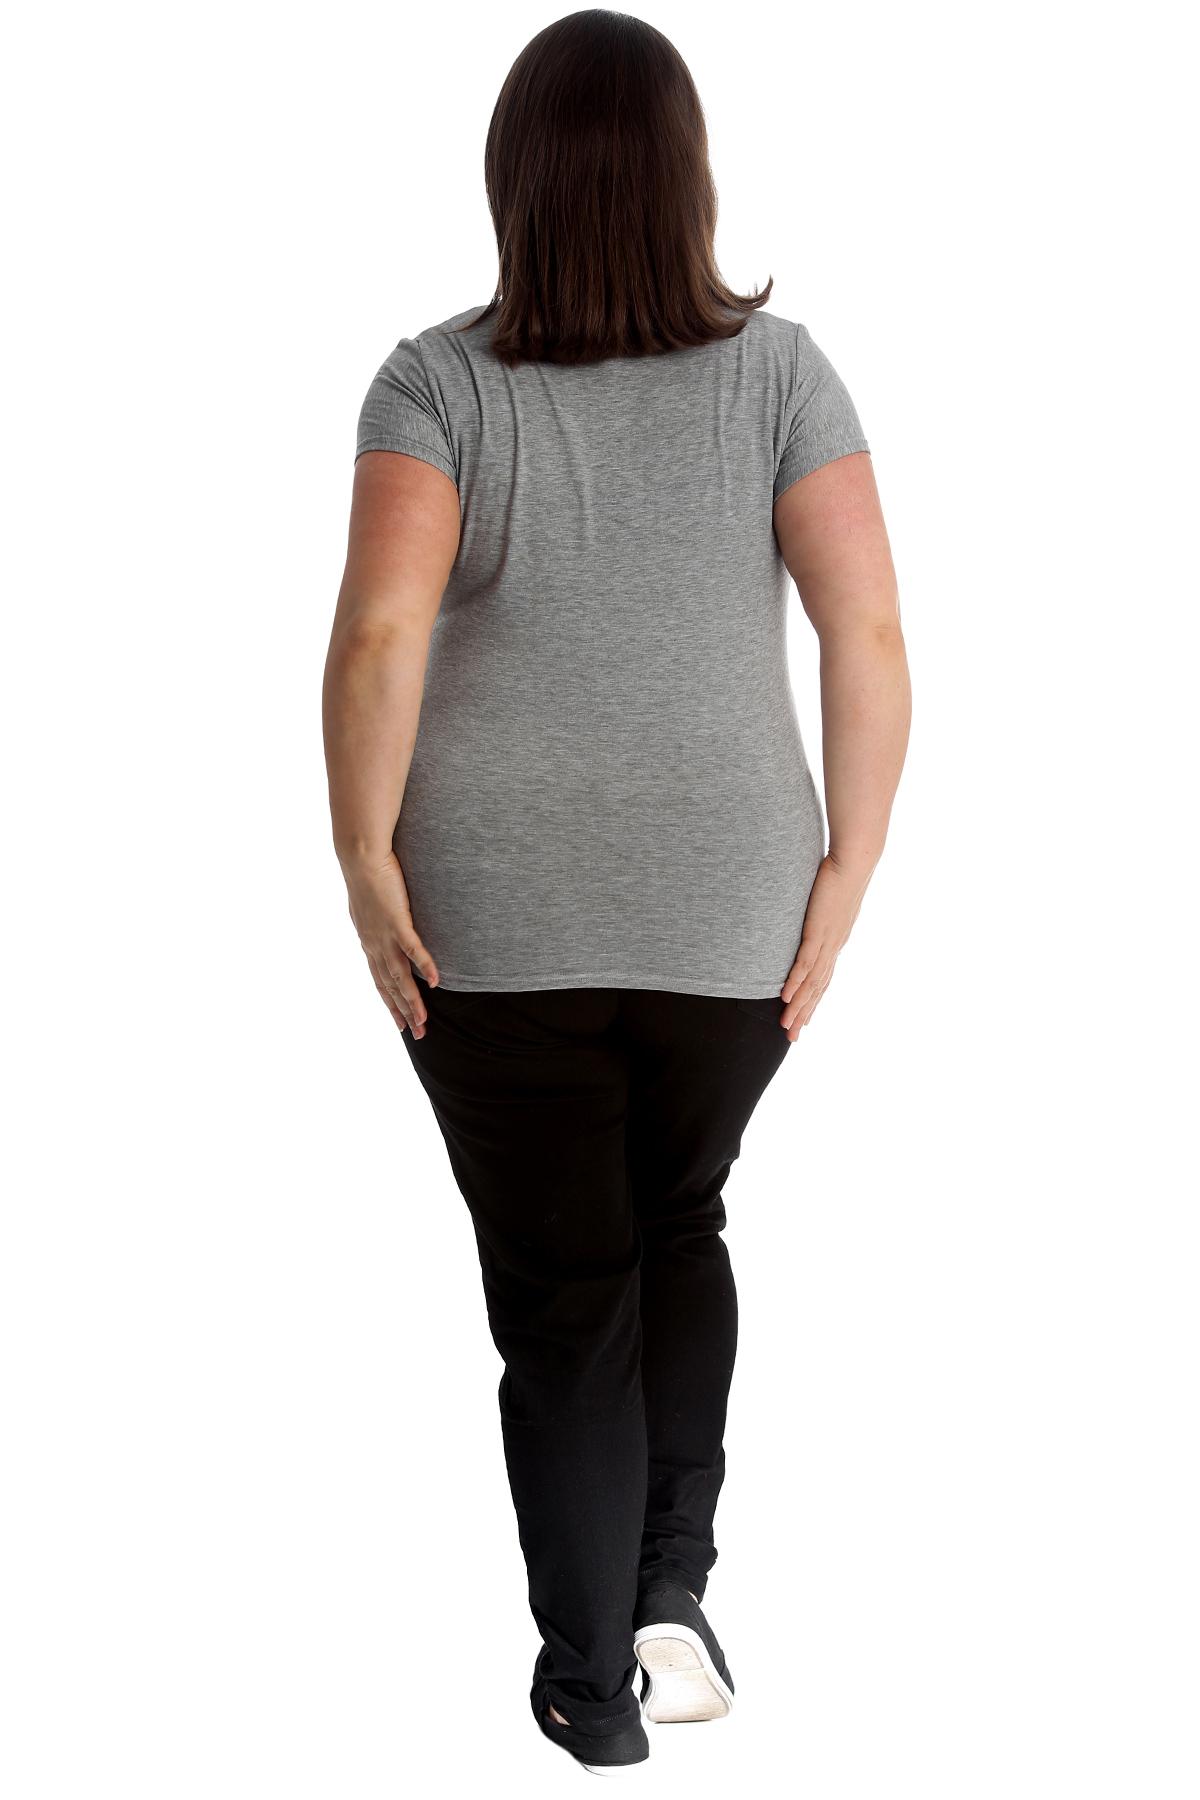 New-Womens-Plus-Size-Top-Ladies-Cherry-Rhinestone-T-Shirt-Soft-Stud-Shiny-Hip thumbnail 30